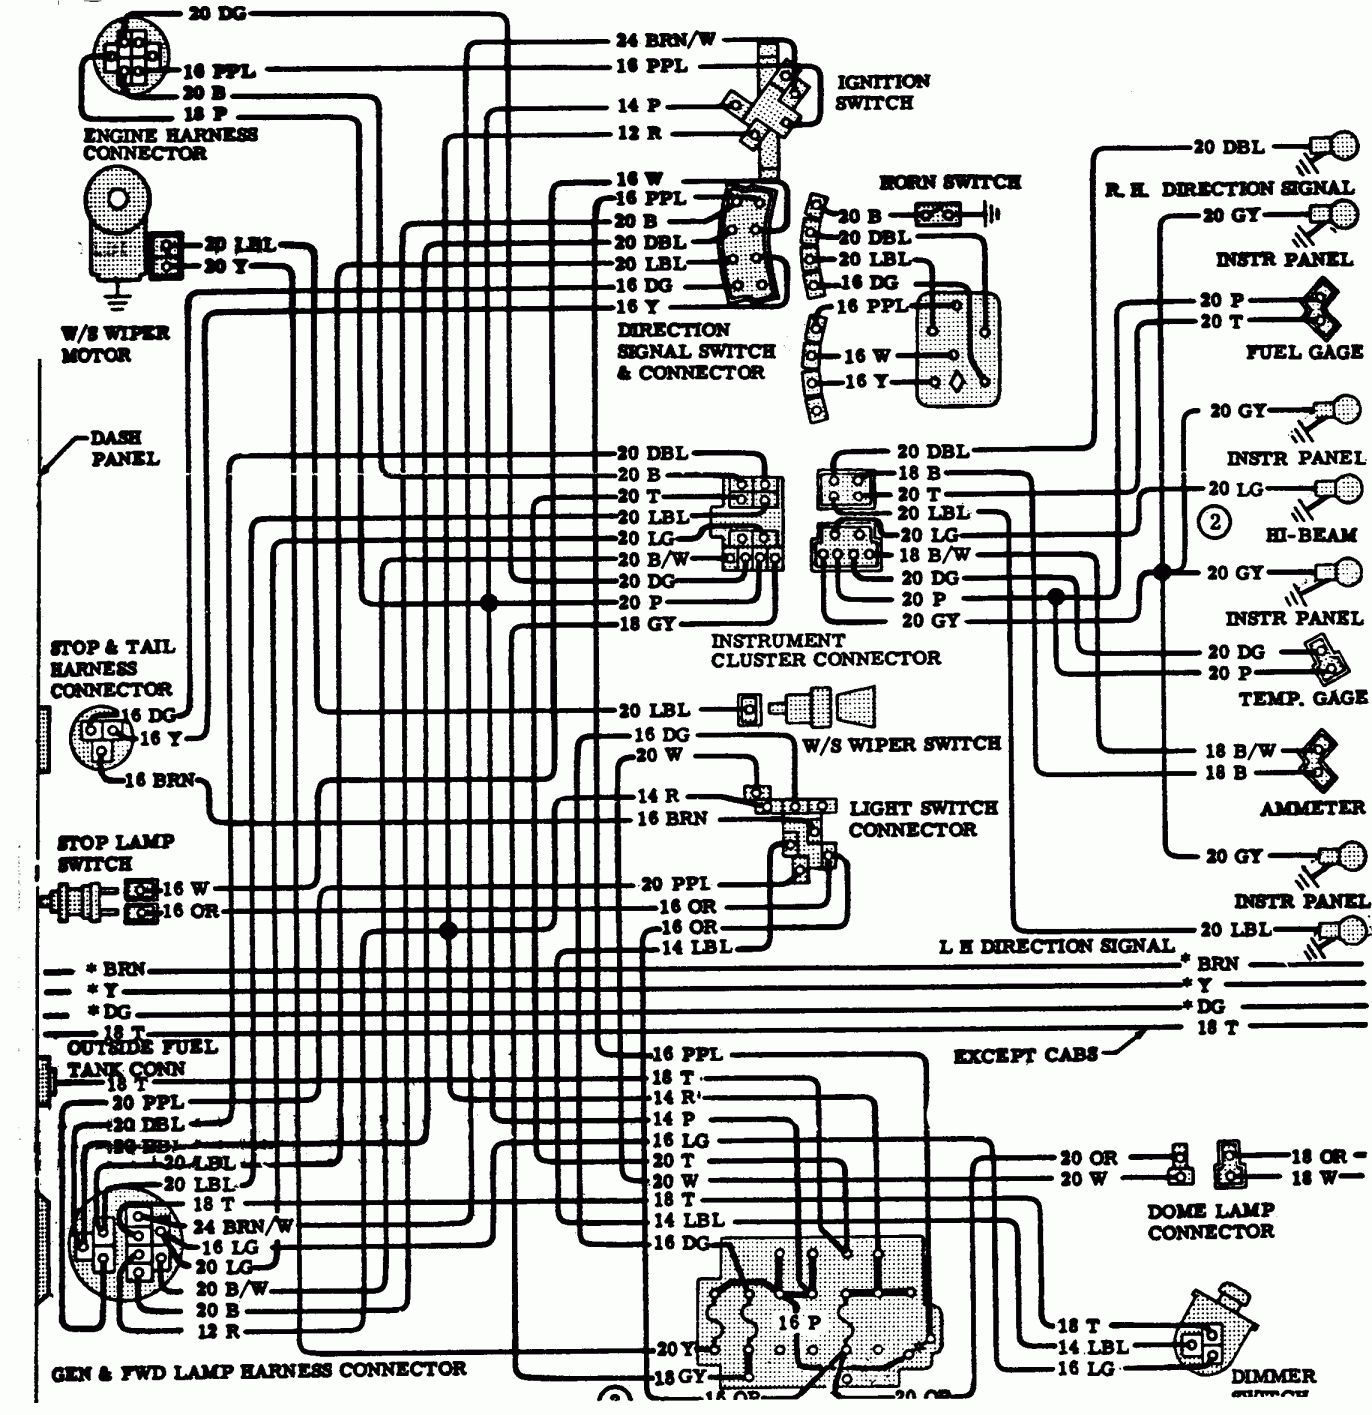 16 1986 Dodge Truck Wiring Diagram Truck Diagram Wiringg Net Pickup Trucks Chevy Trucks 1974 Chevy Truck